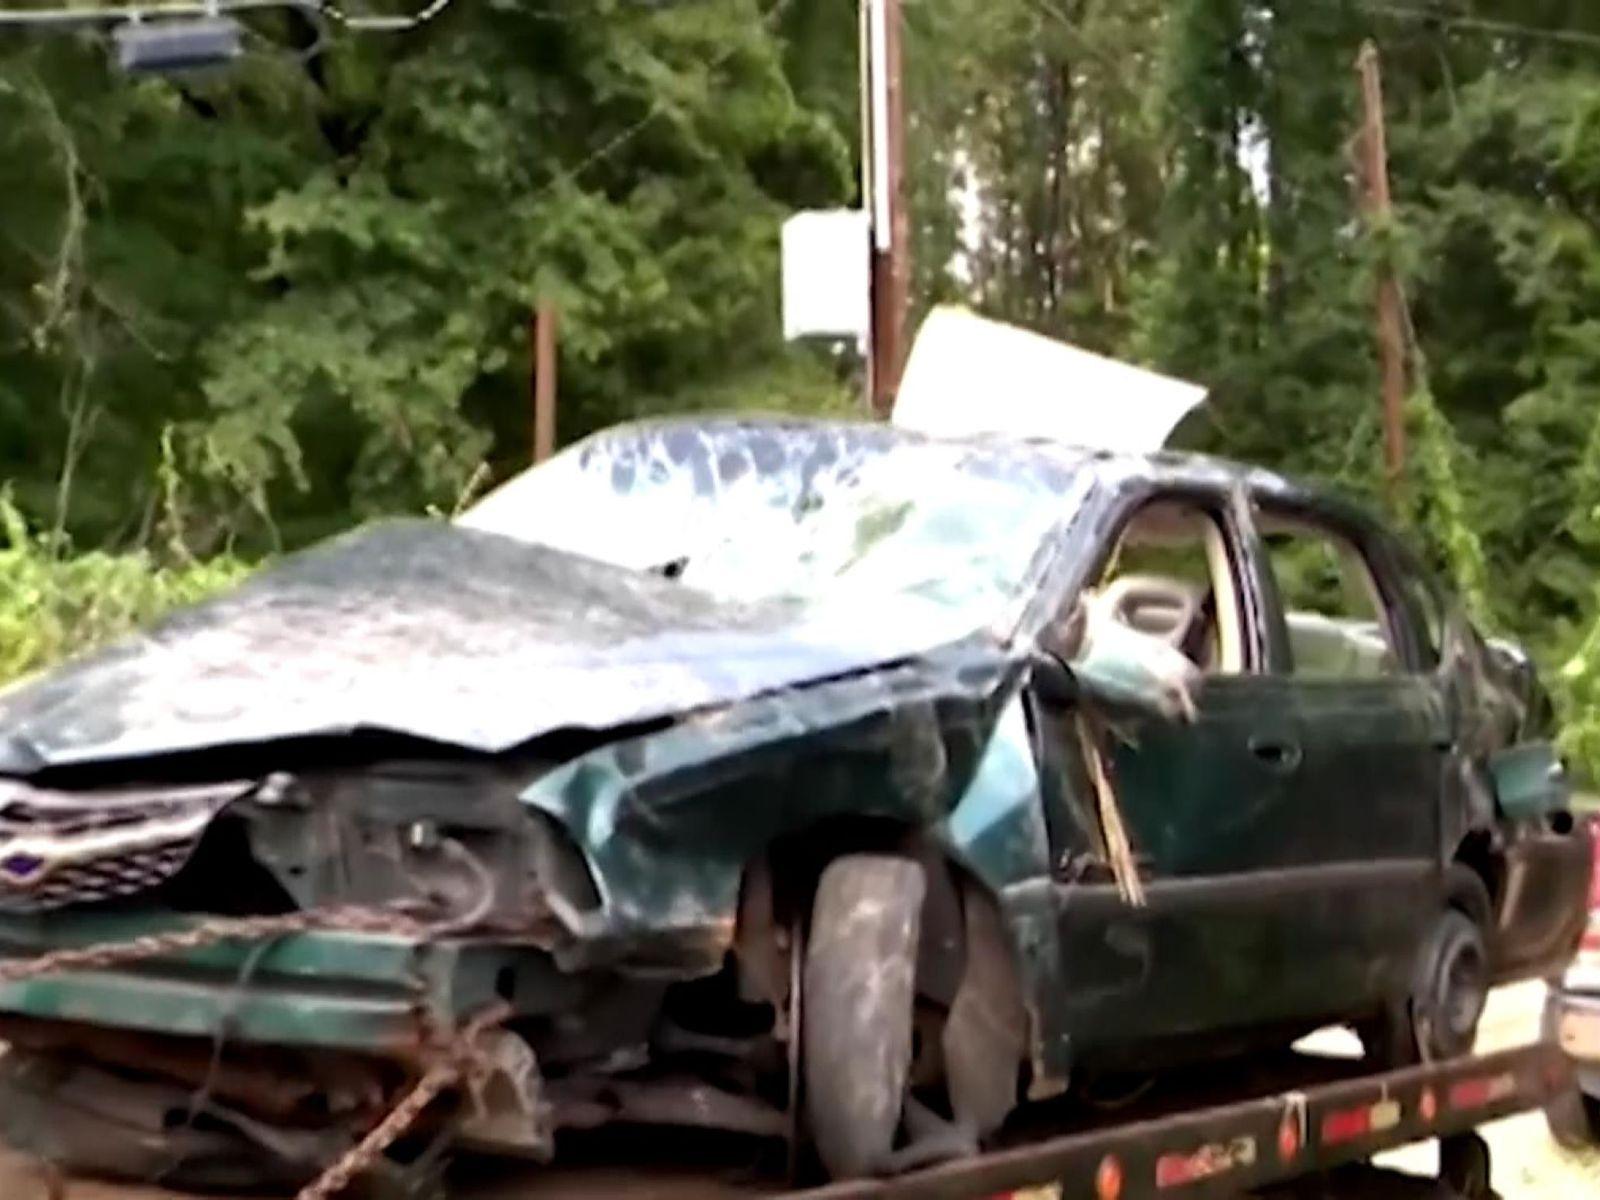 Crash Cars For Sale In Arkansas